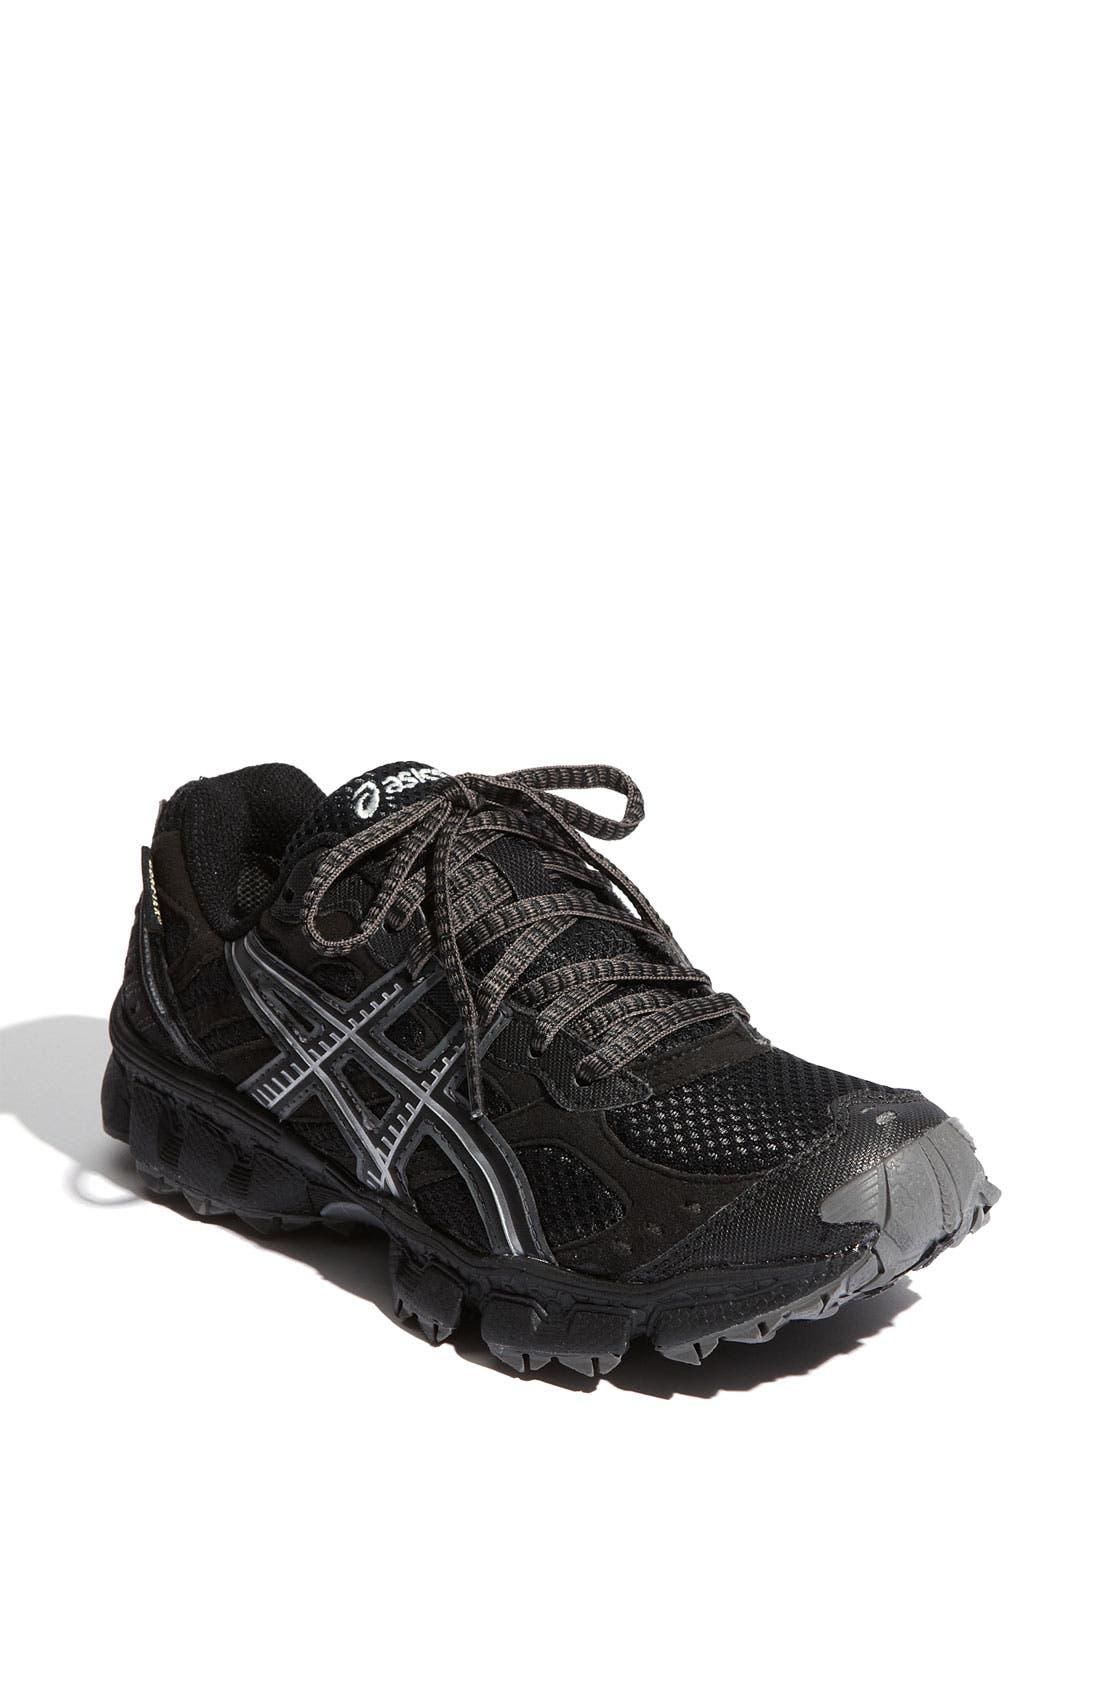 Main Image - ASICS® 'GEL Trail-Lahar 3' Trail Running Shoe (Women)